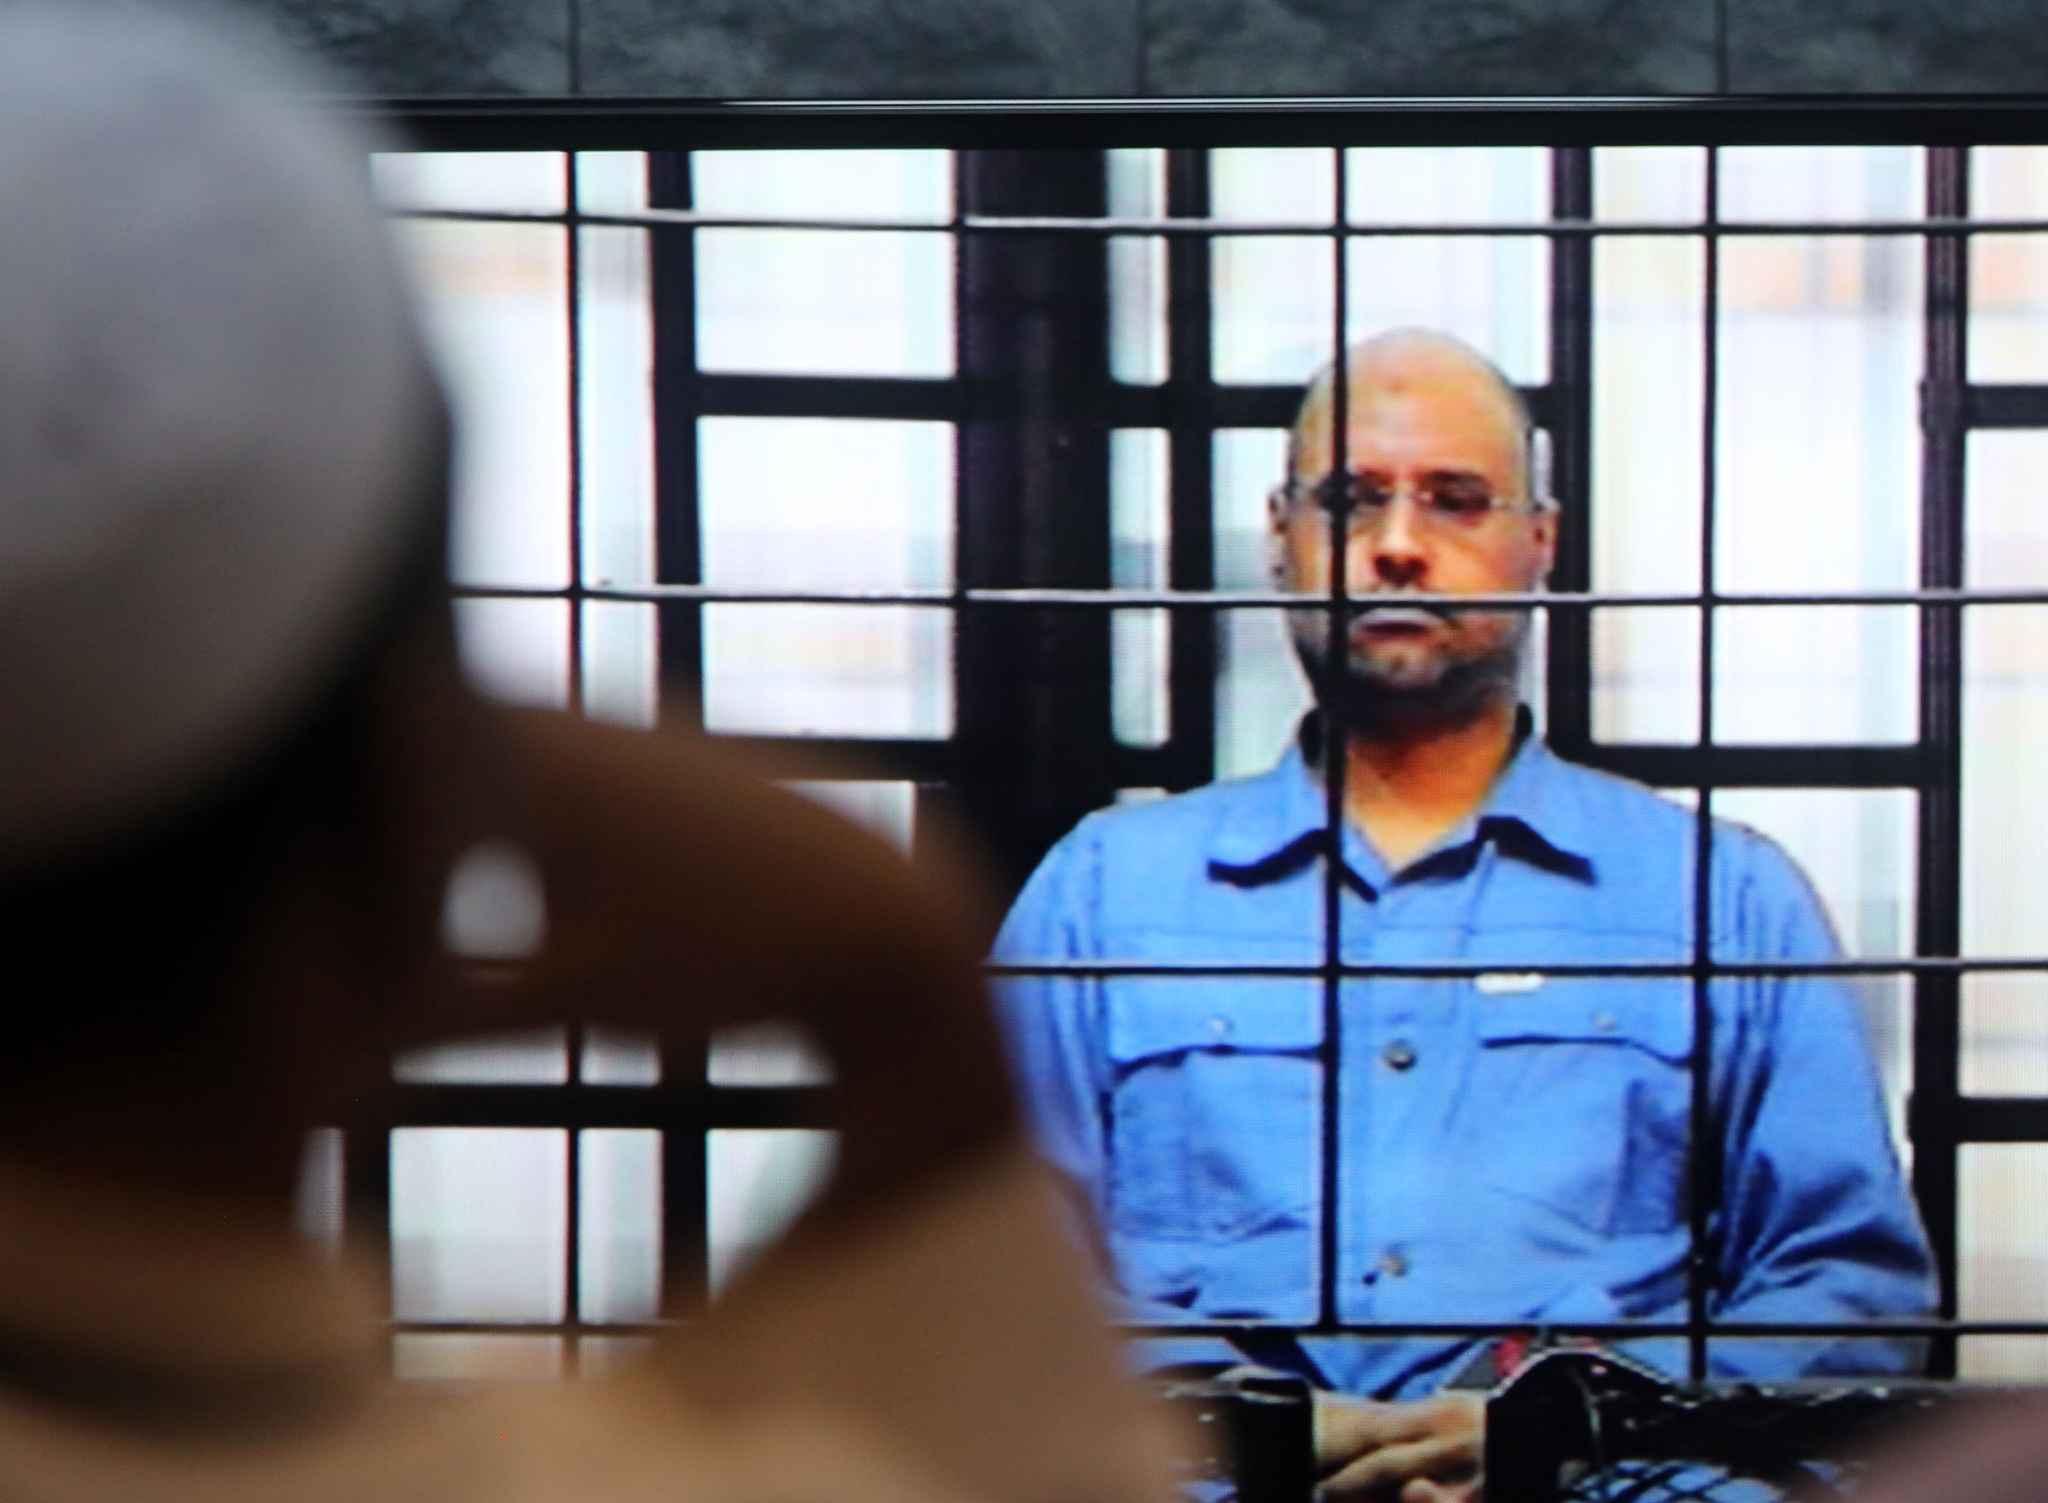 Libye : un groupe armé dit avoir libéré le fils de Kadhafi Seif al-Islam